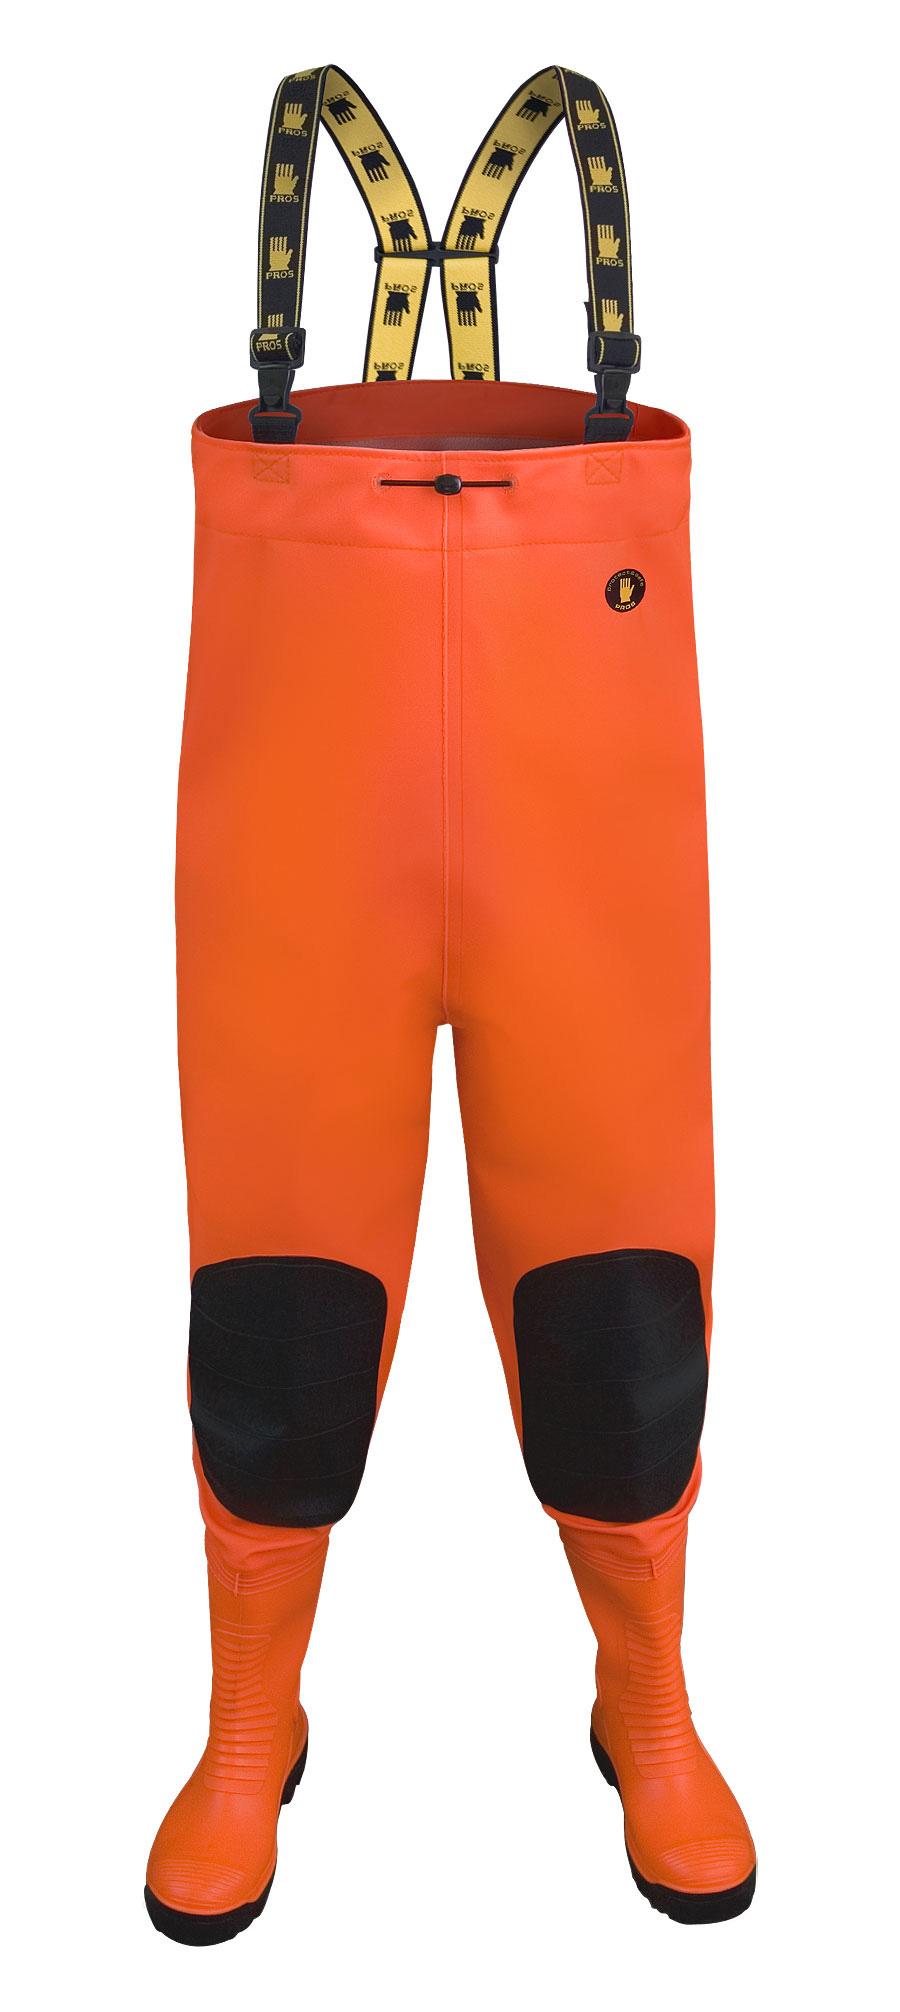 Brodící kalhoty MAX Fluo oranž vel.45    SBM01 Fluo or.  PROS